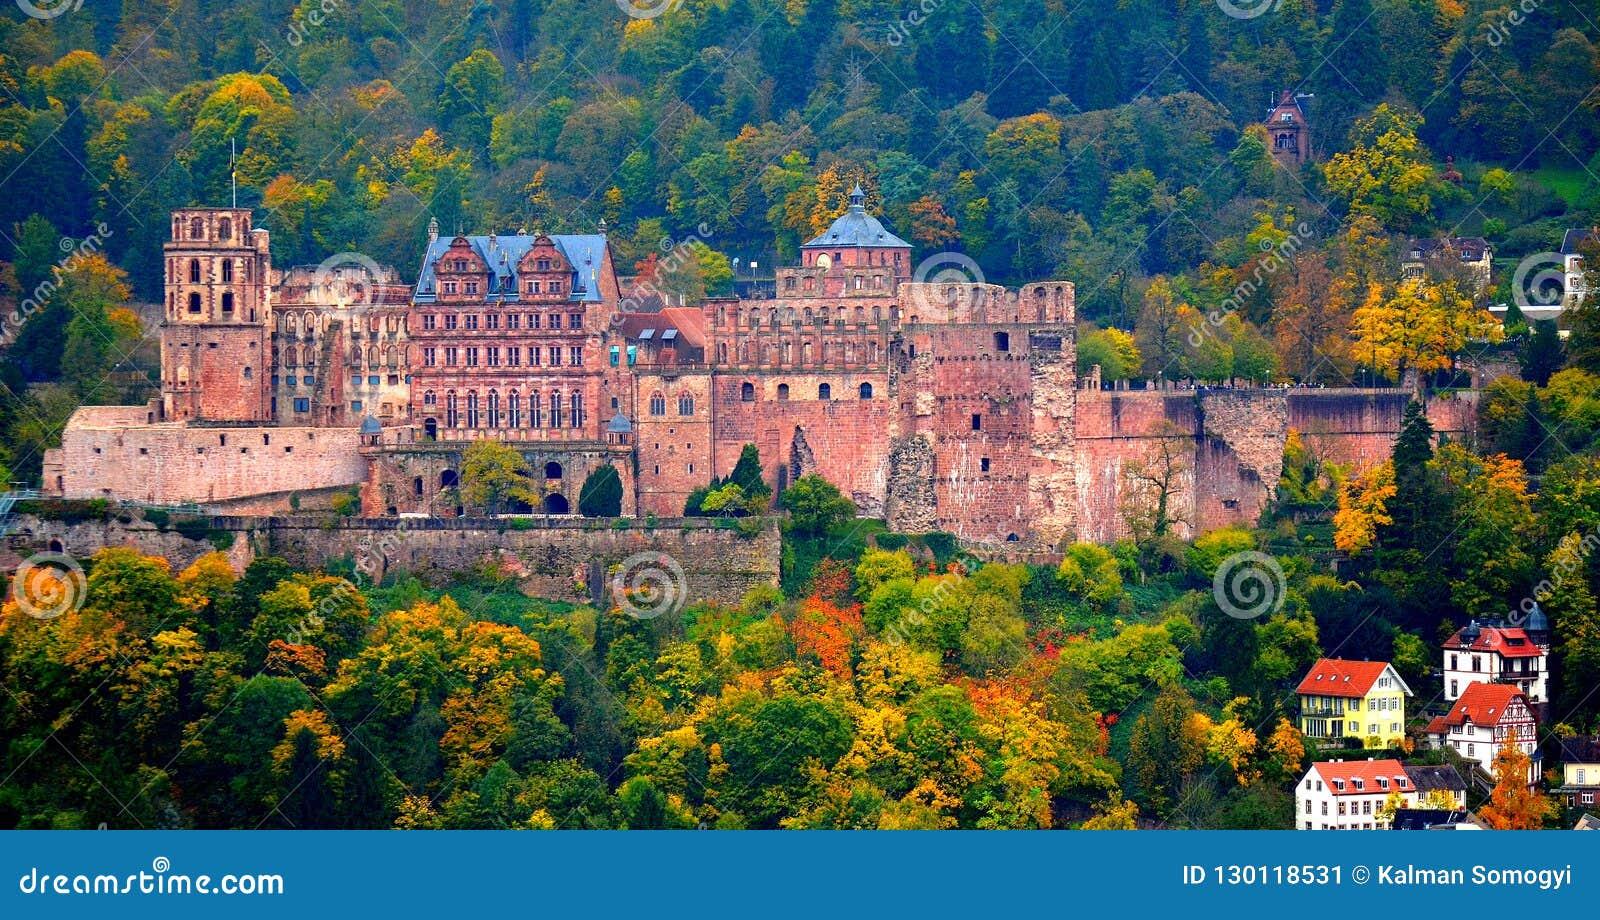 The ancient Heidelberg castle in autumn